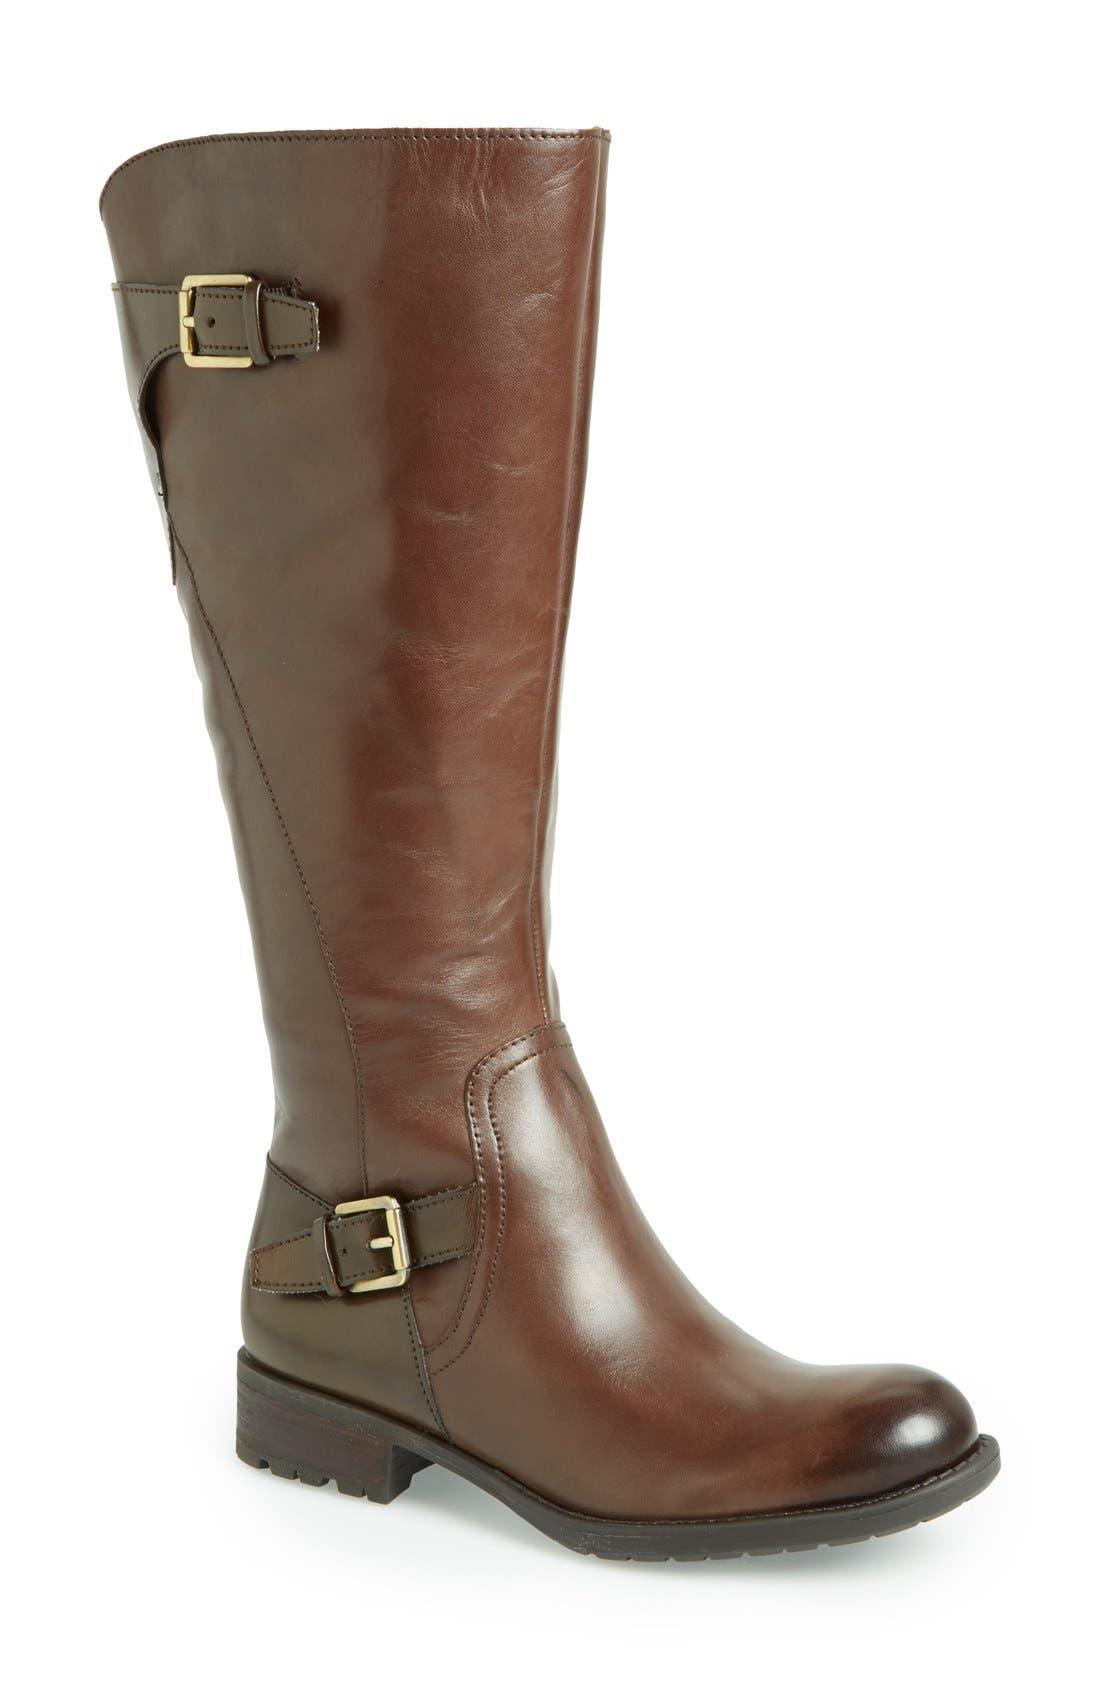 Alternate Image 1 Selected - Franco Sarto 'Perk' Tall Boot (Women)